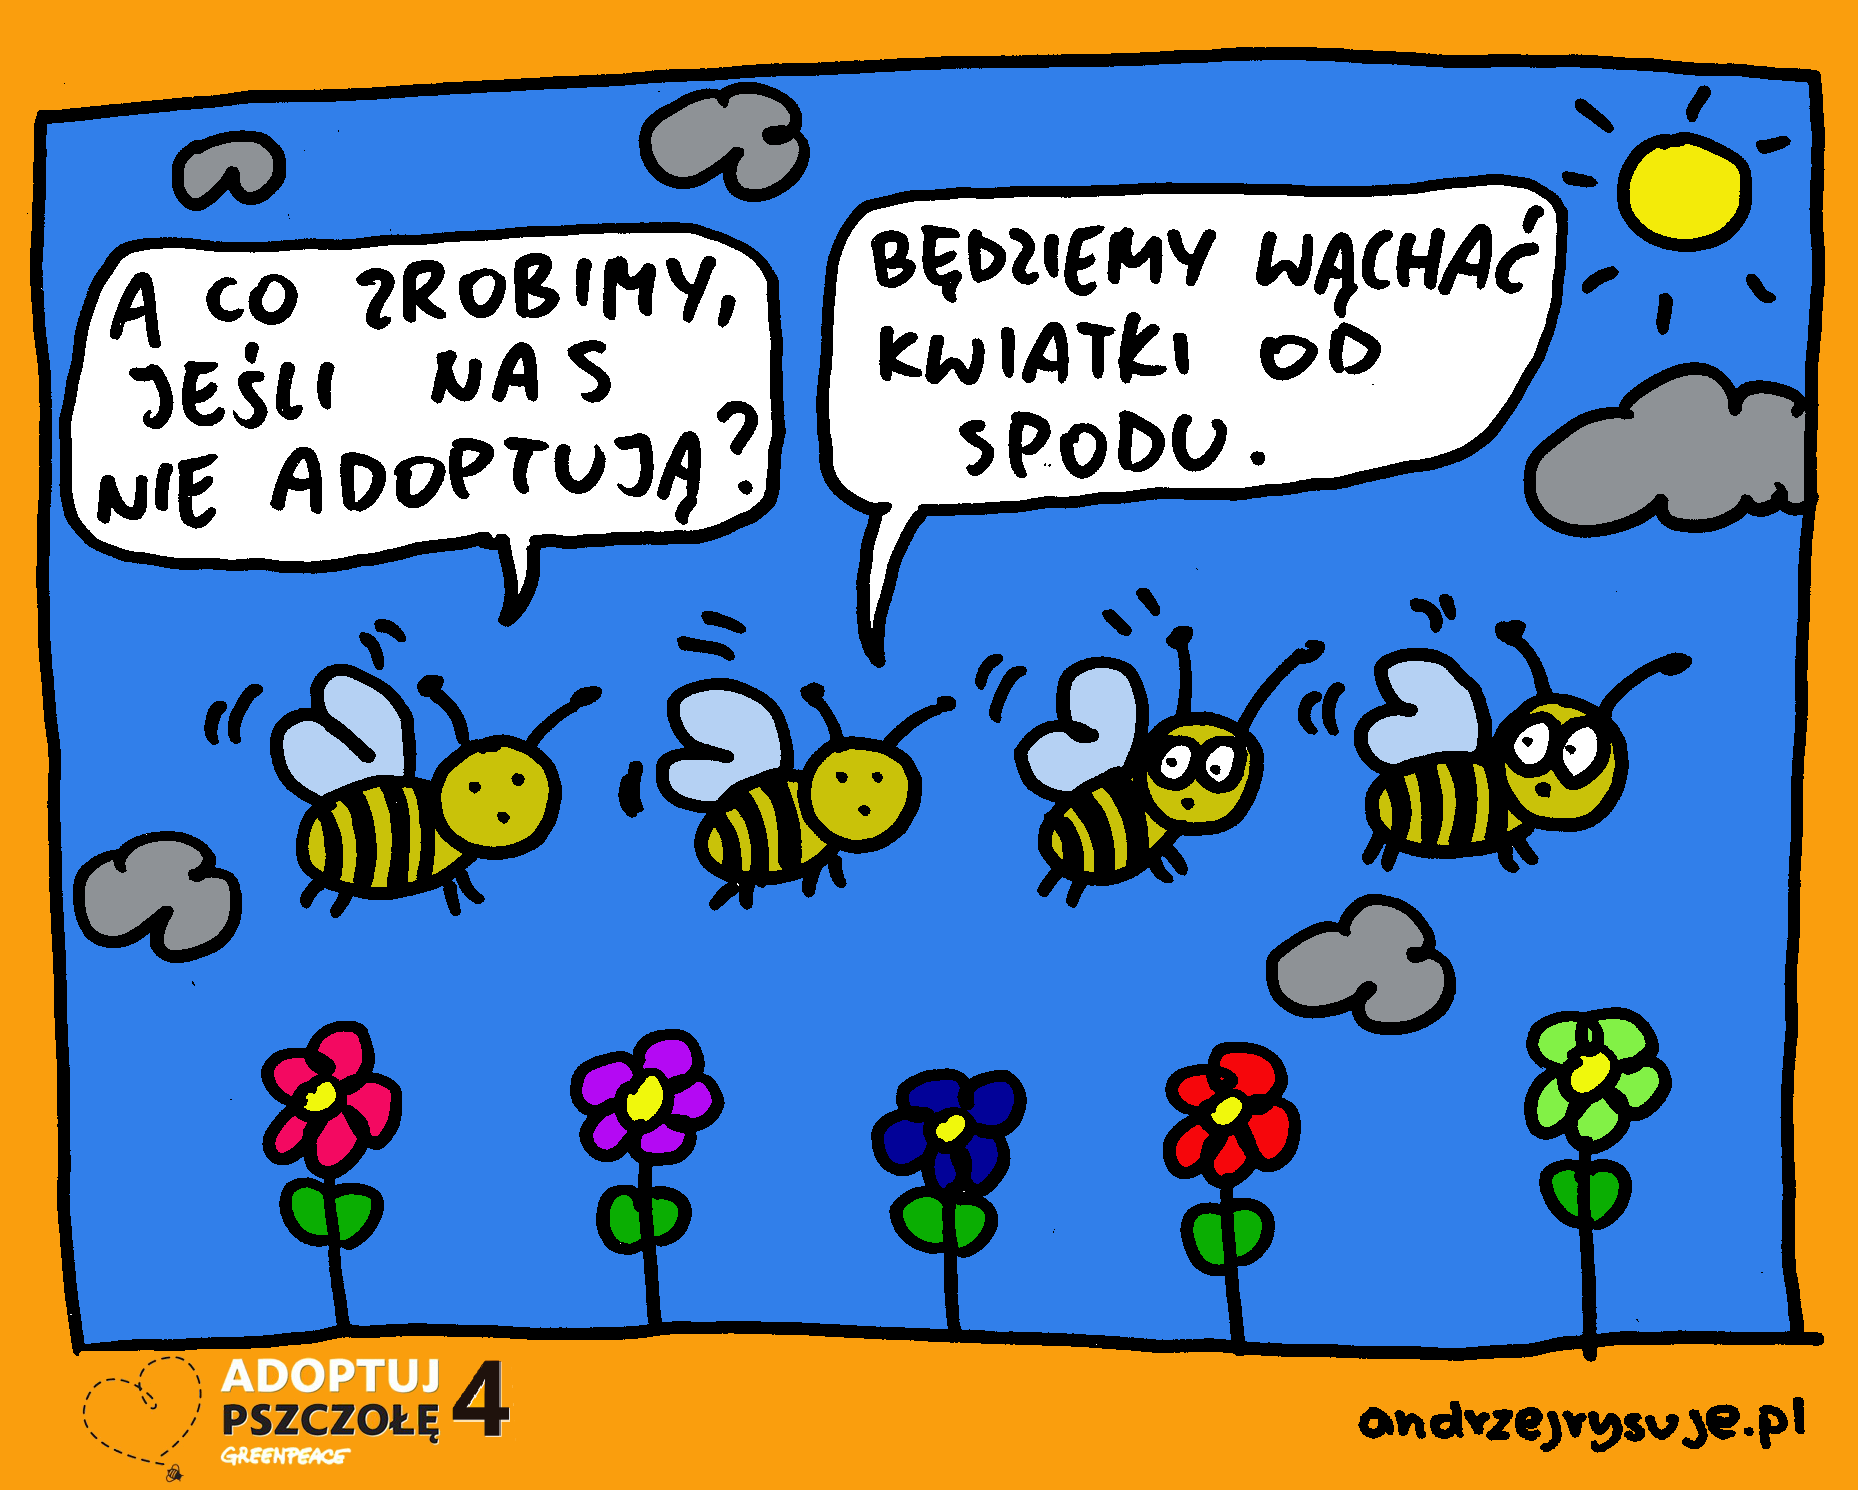 adoptuj-3